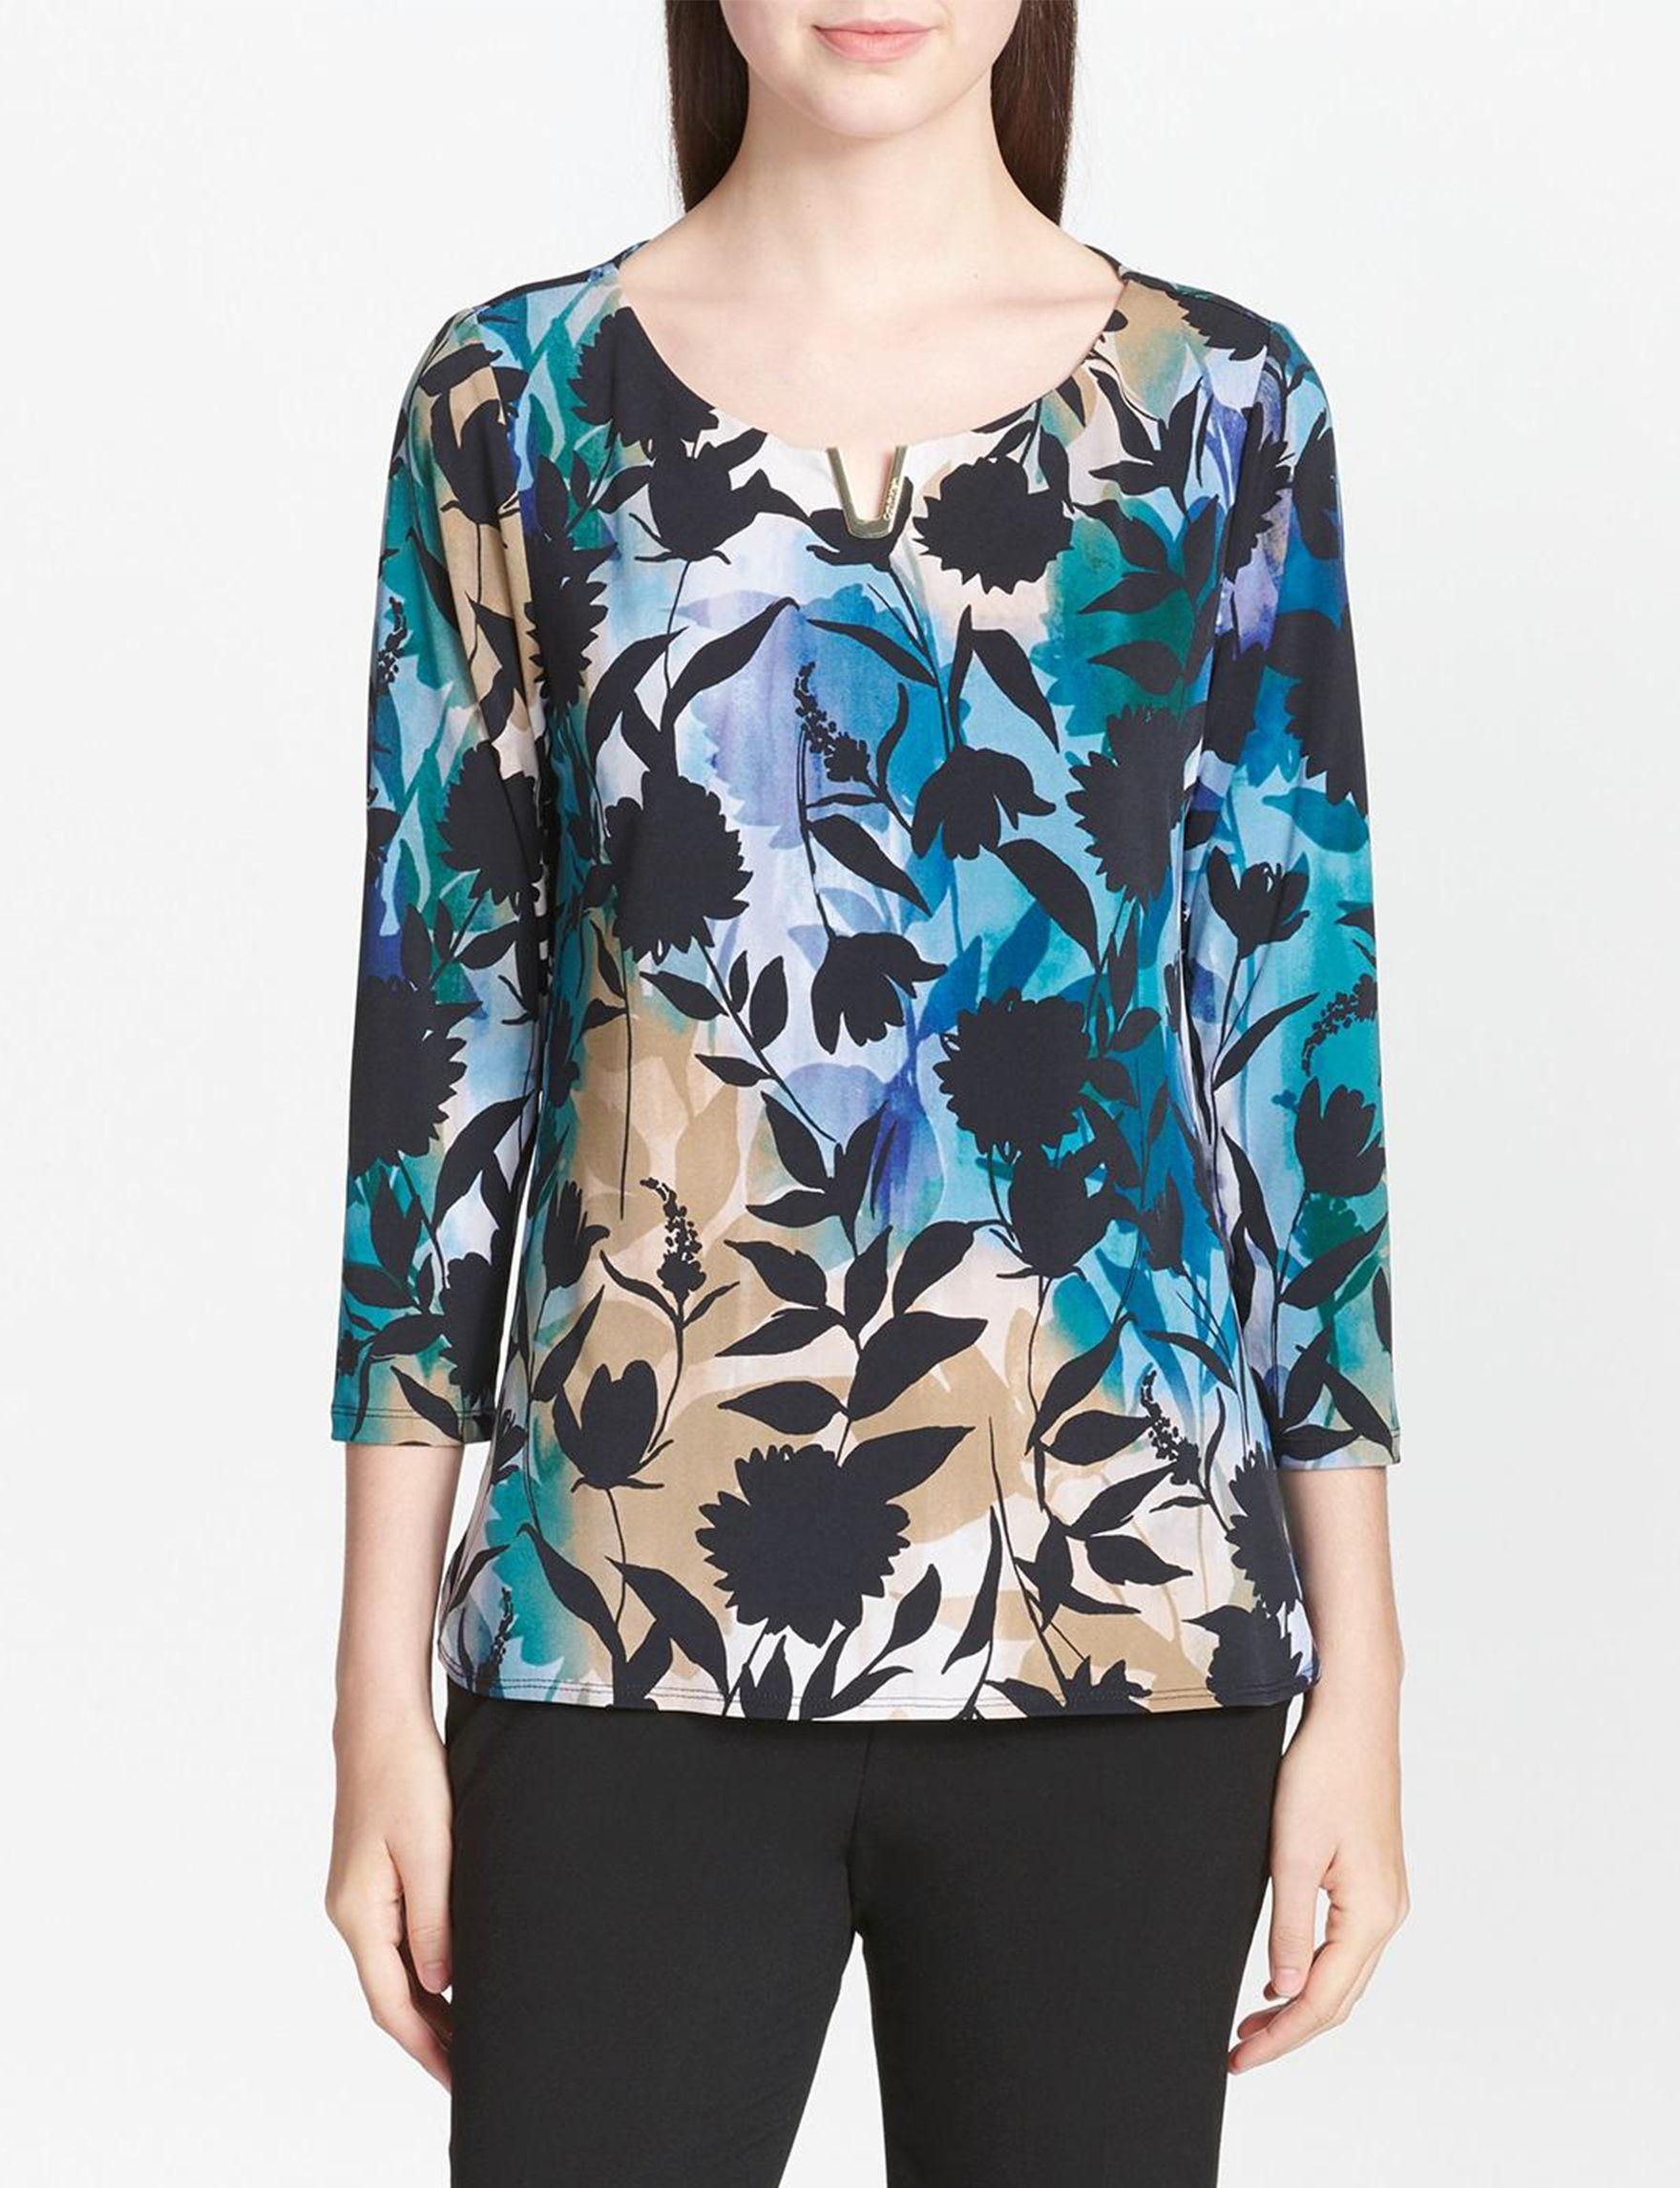 Calvin Klein Green / Multi Shirts & Blouses